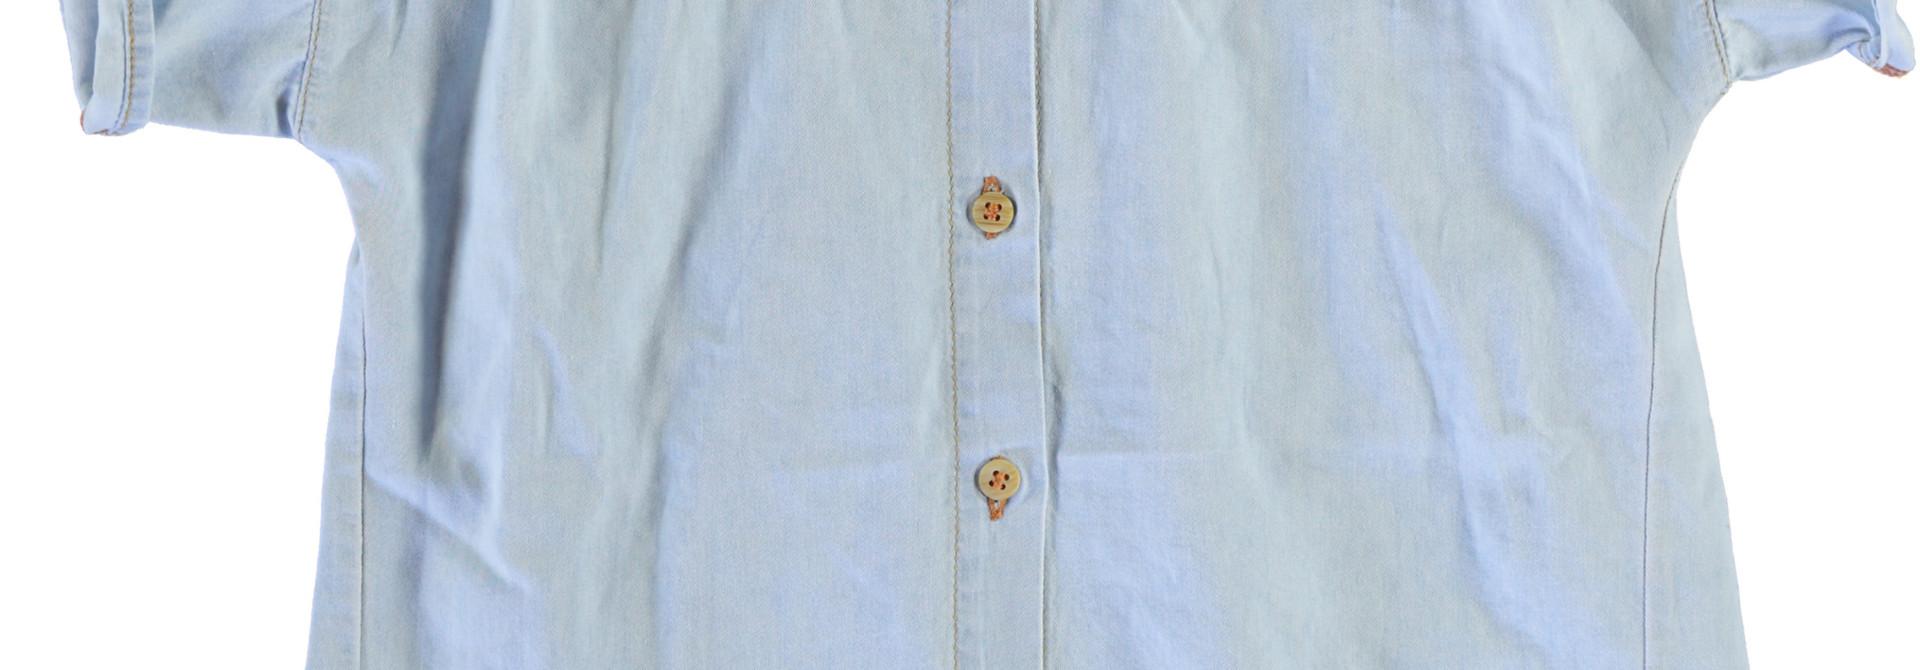 peter pan shirt | light blue washed denim